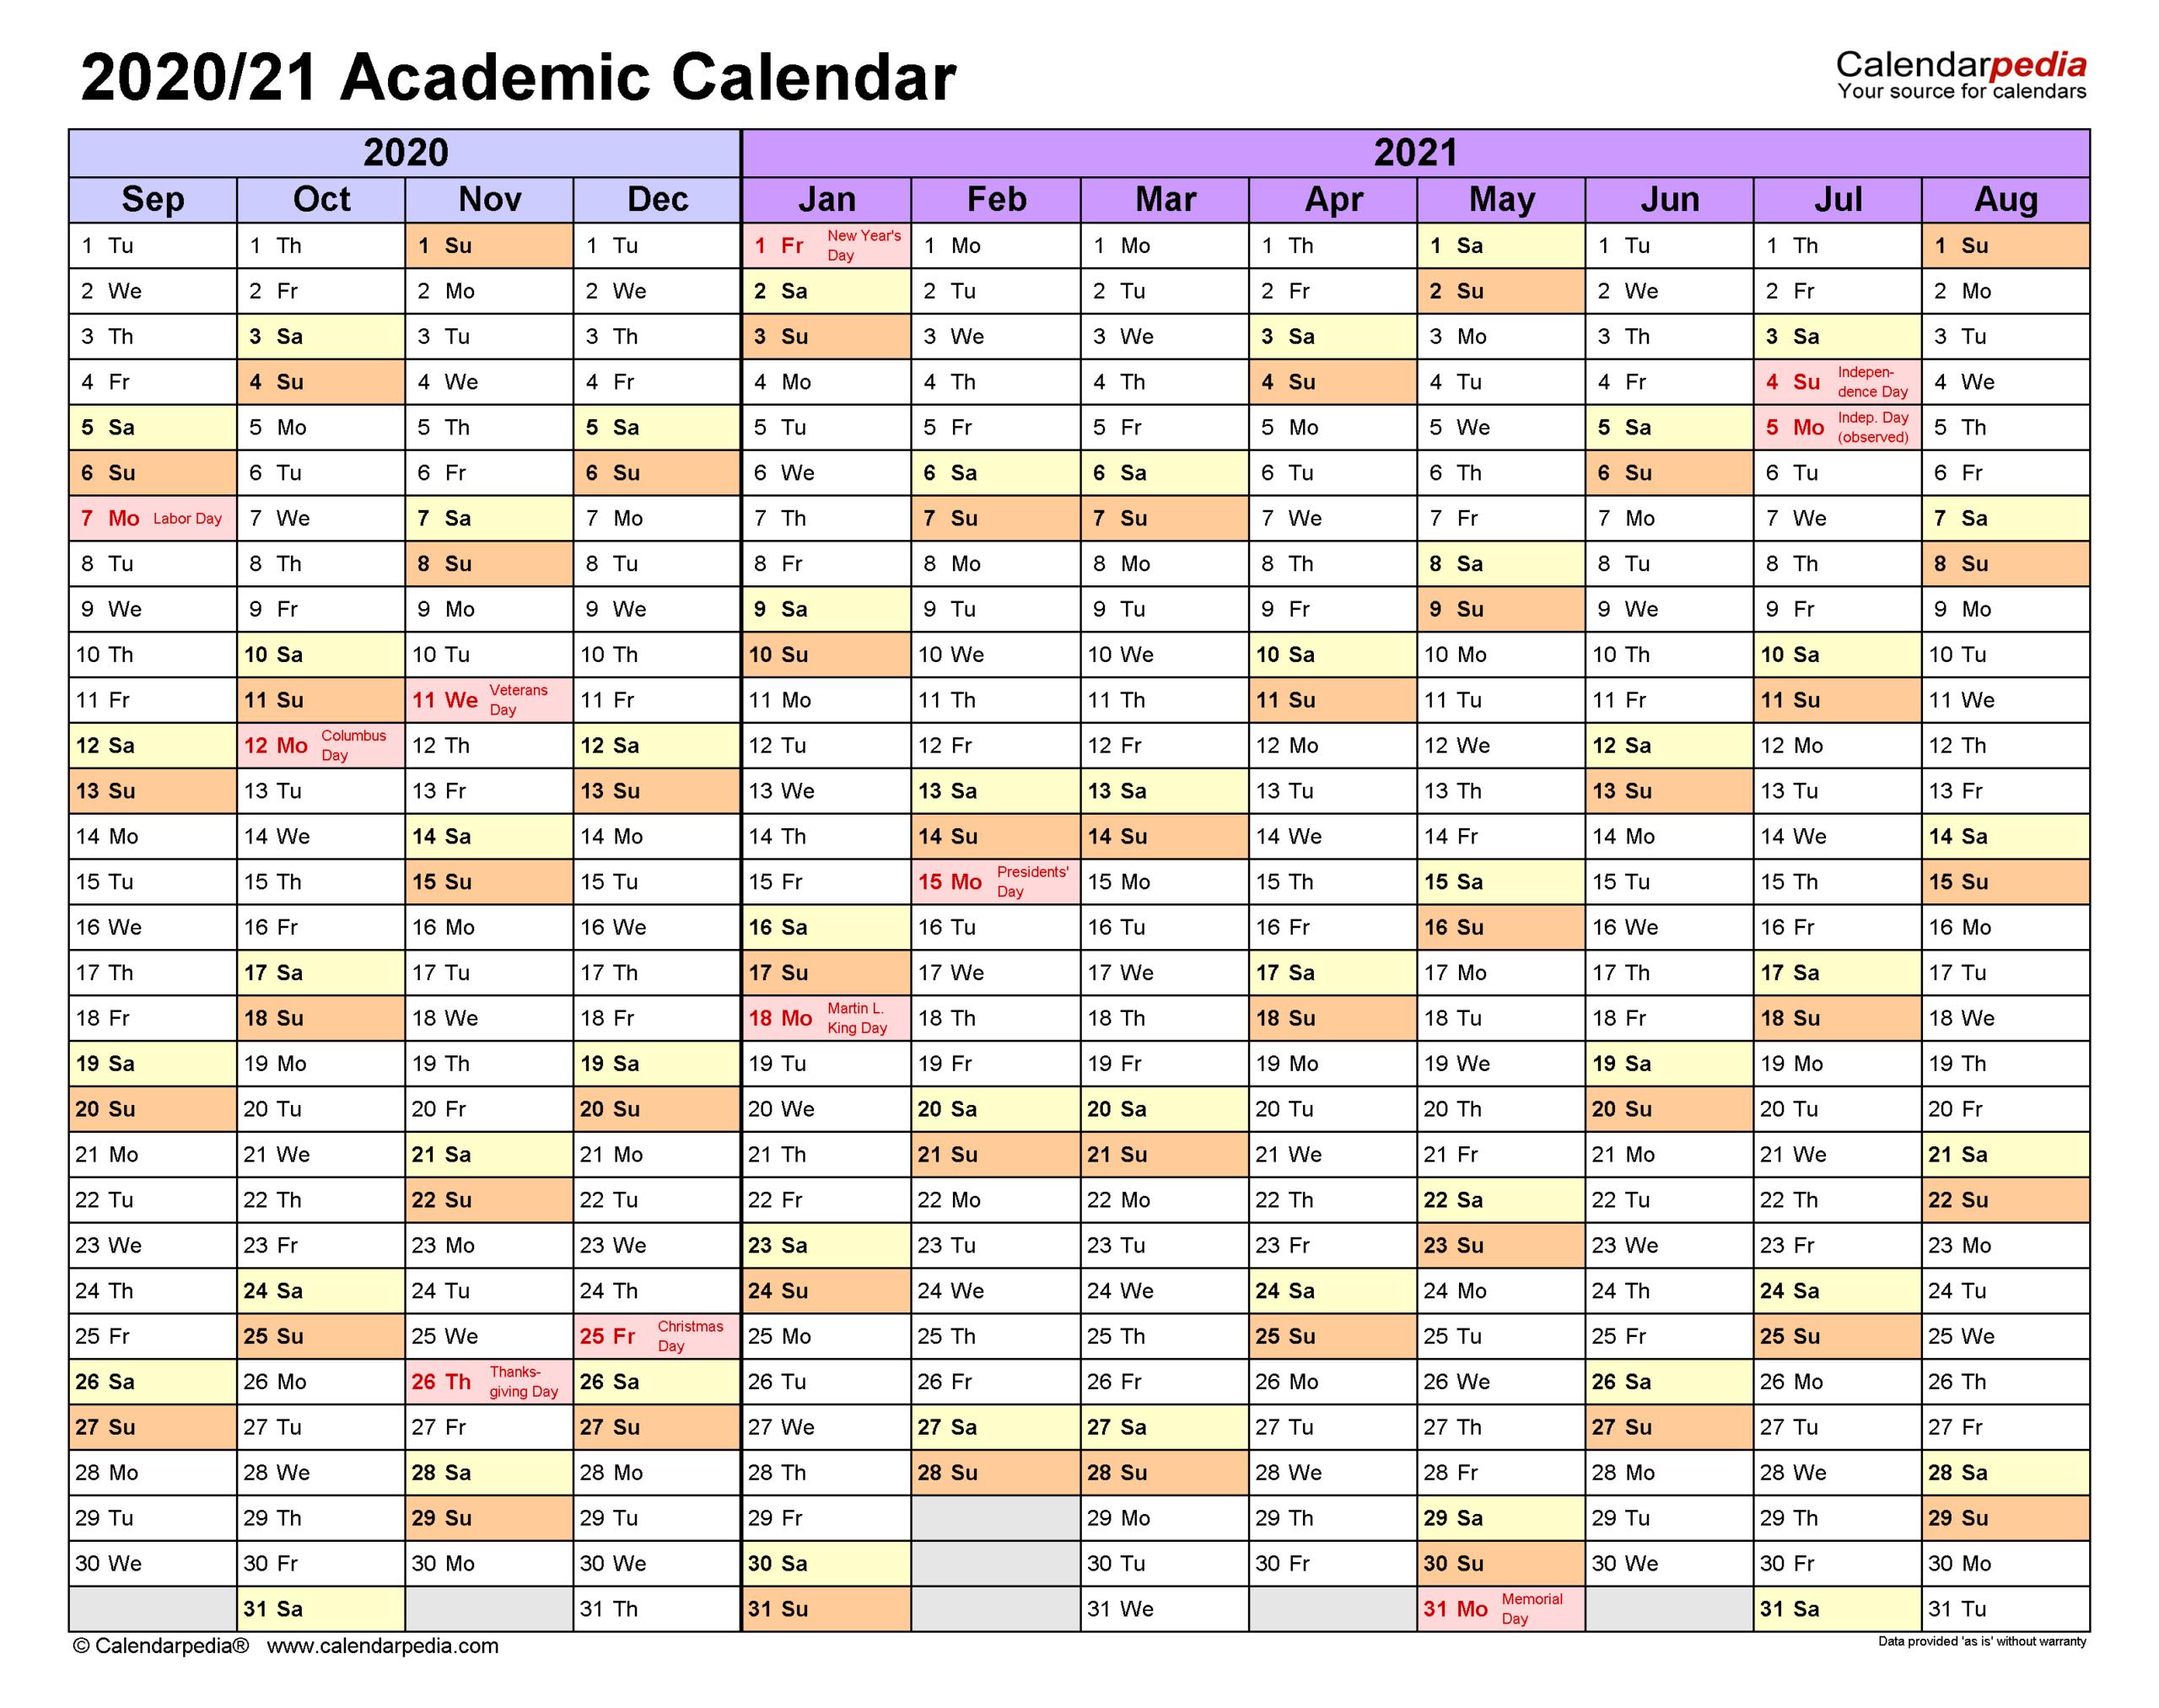 Academic Calendars 2020/2021 - Free Printable Pdf Templates pertaining to Sunday To Saturday Year Calendar 2021/21